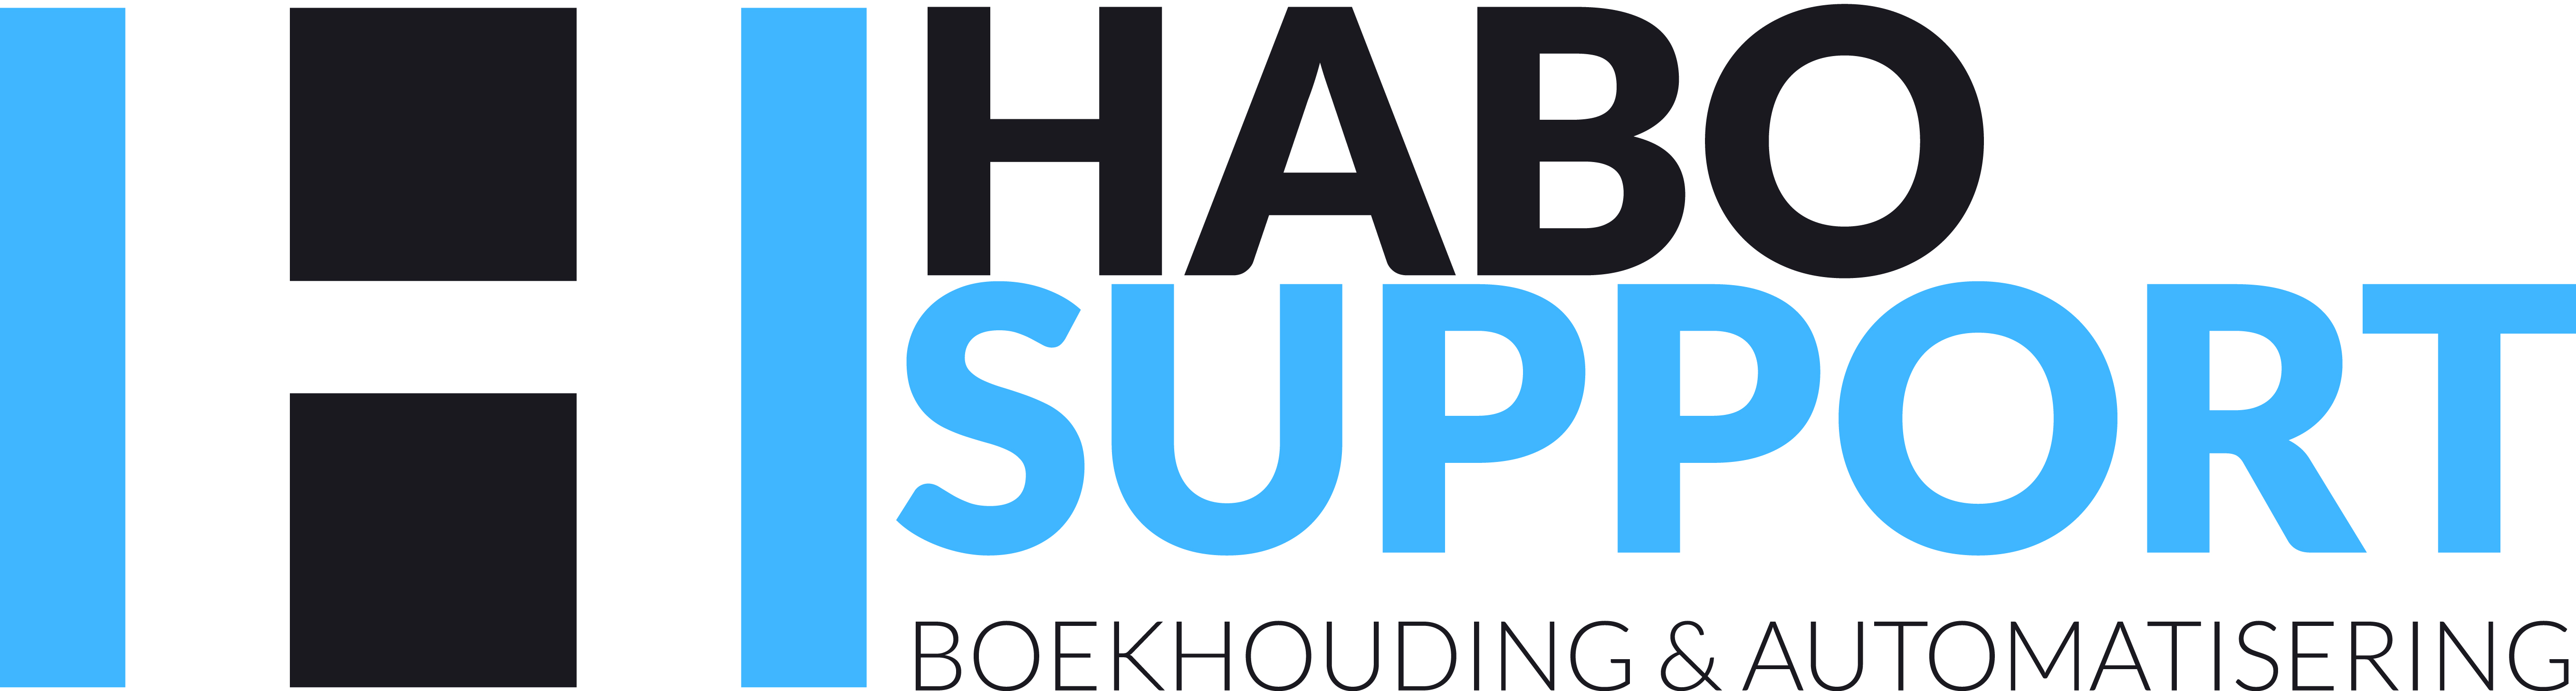 LOGO HABO SUPPORT